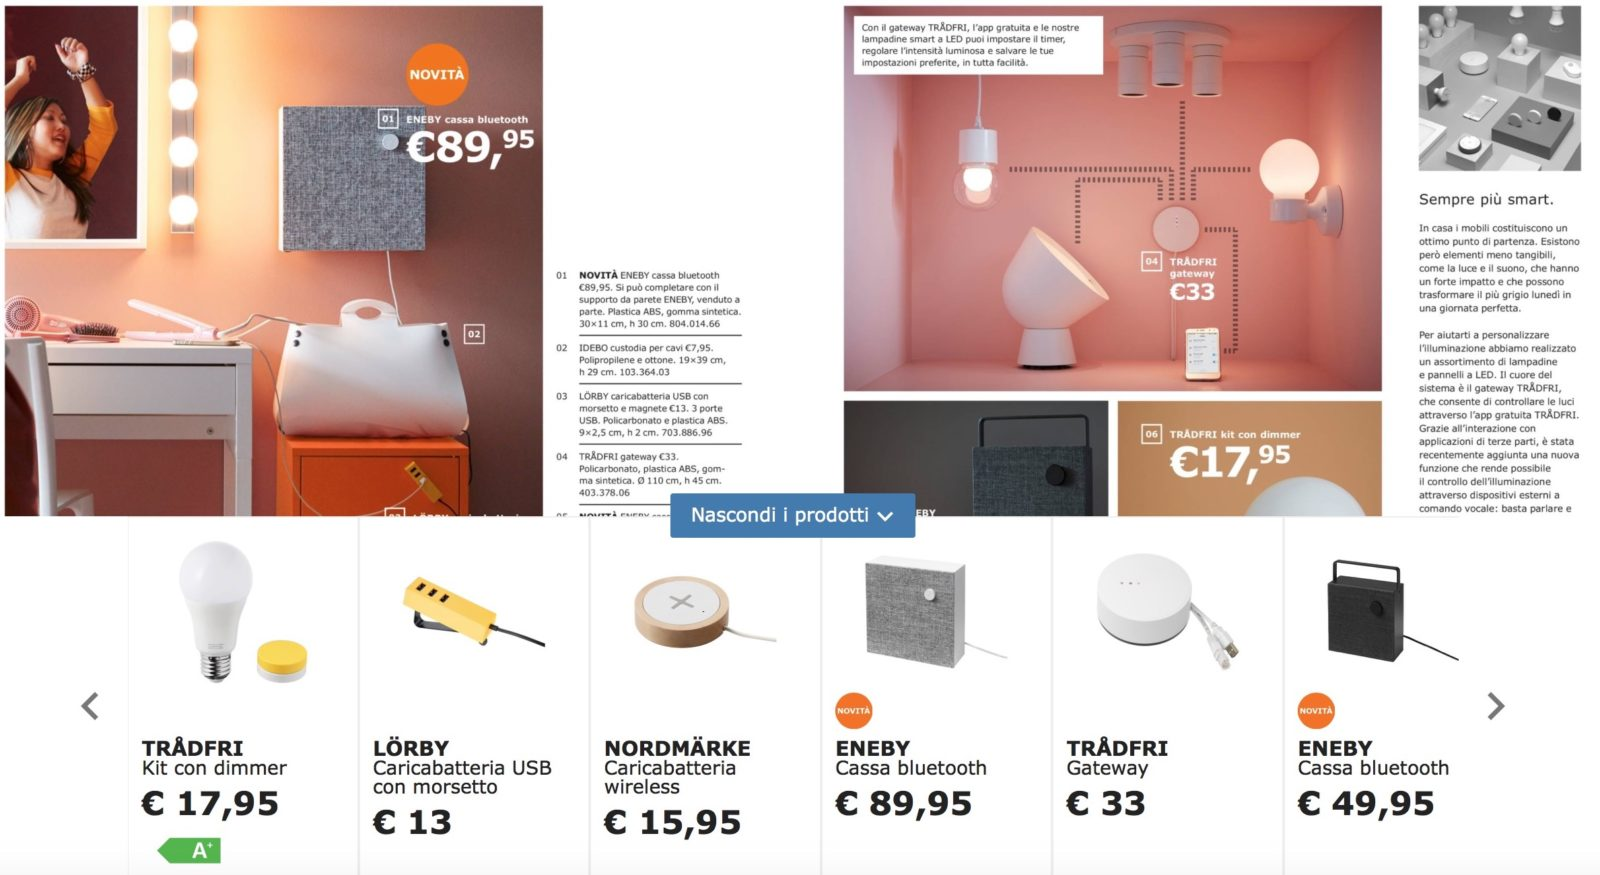 Catalogo ikea 2019 tra casa smart e speaker bluetooth - Catalogo ikea a casa ...